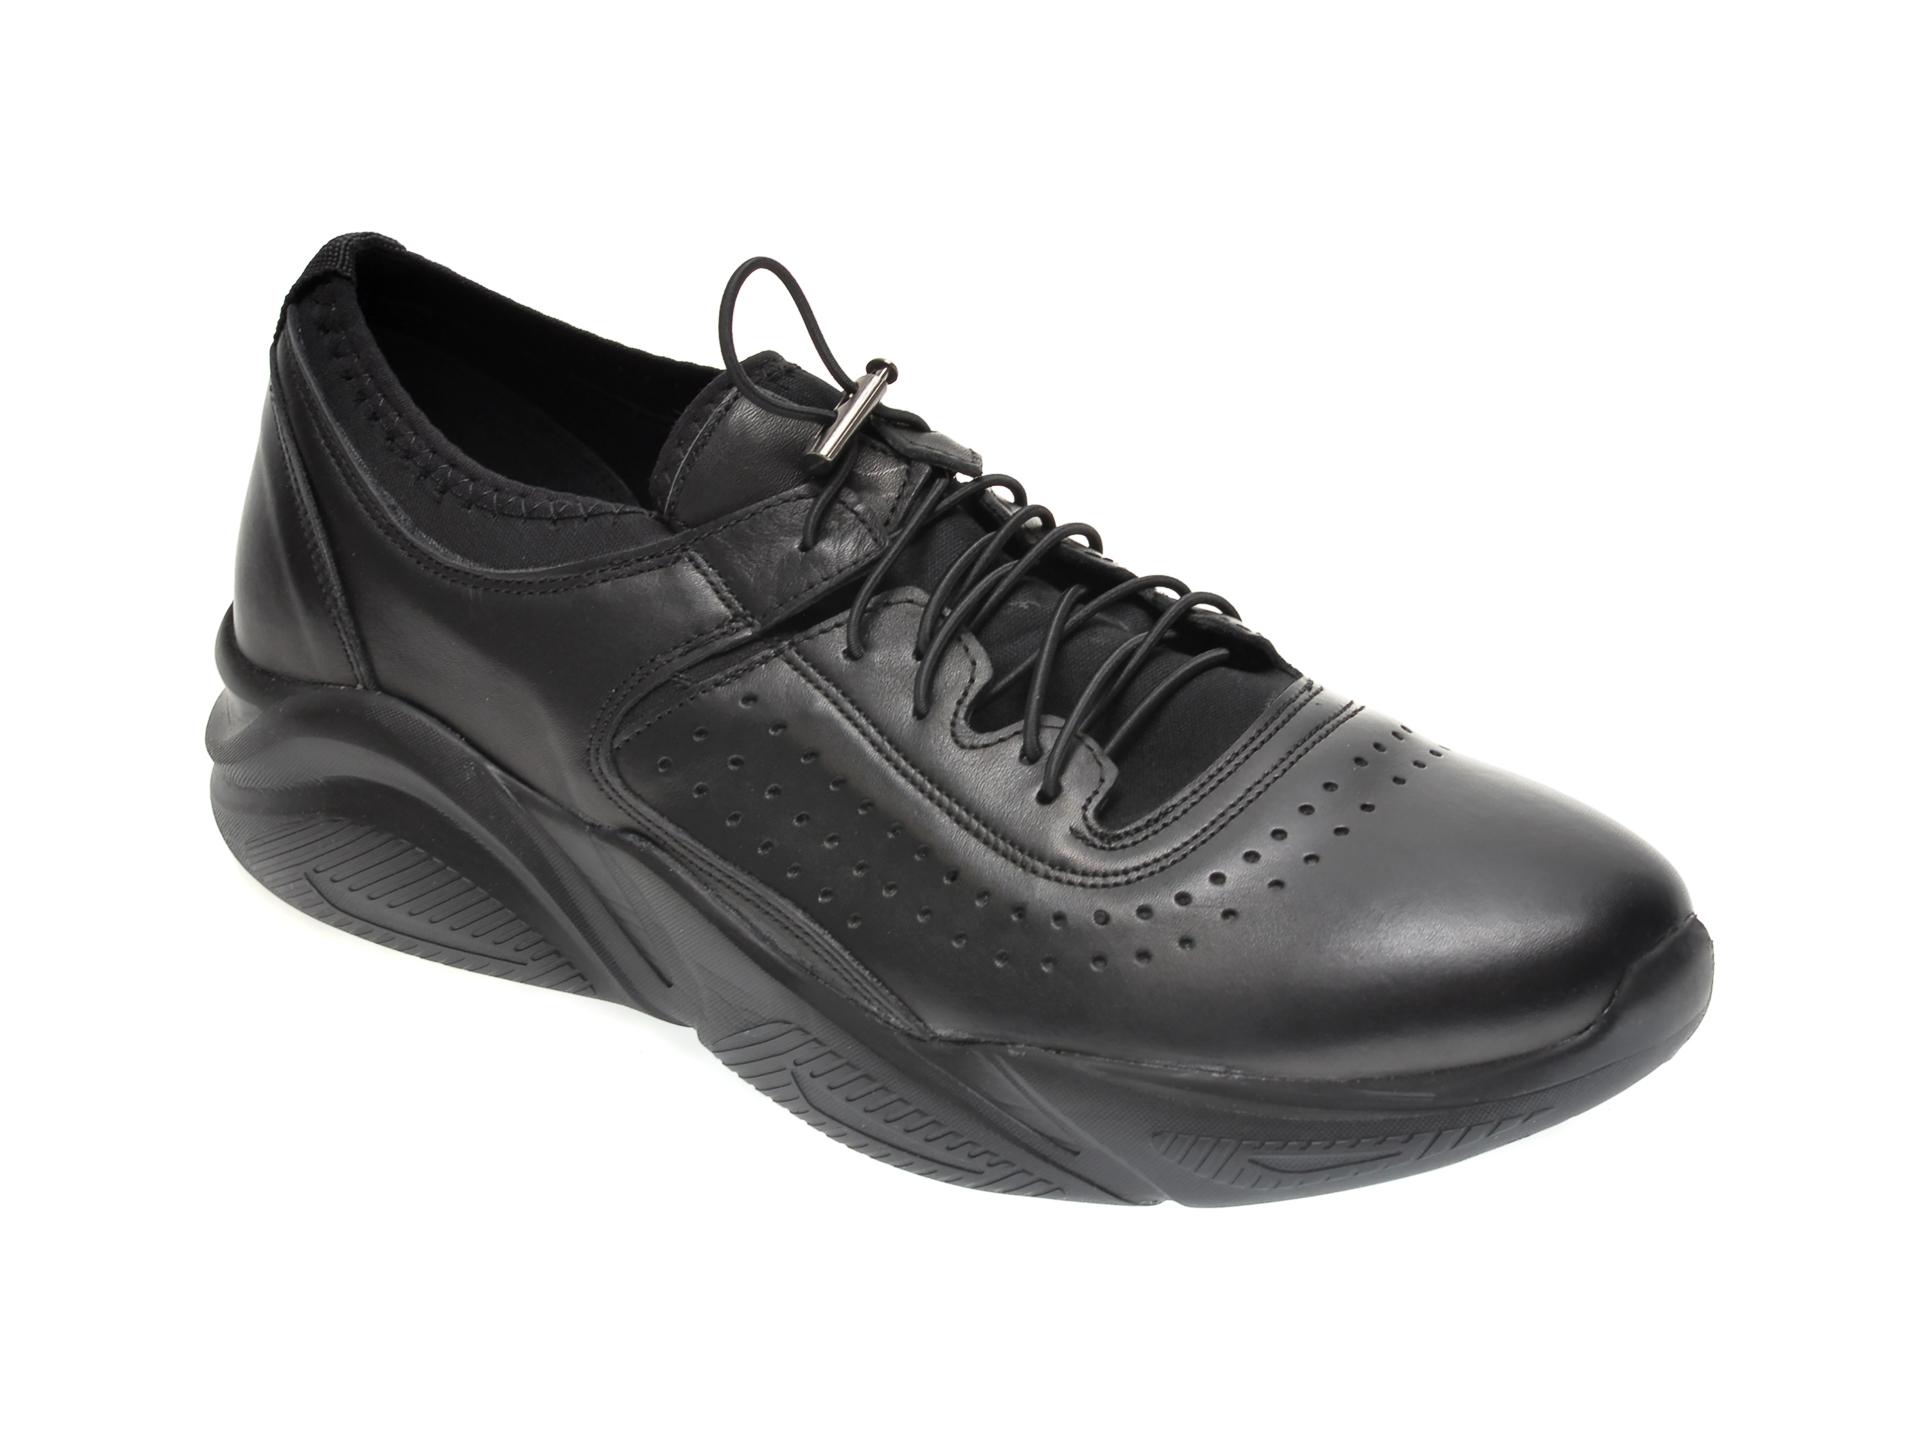 Pantofi Otter Negri, M5744, Din Material Textil Si Piele Naturala